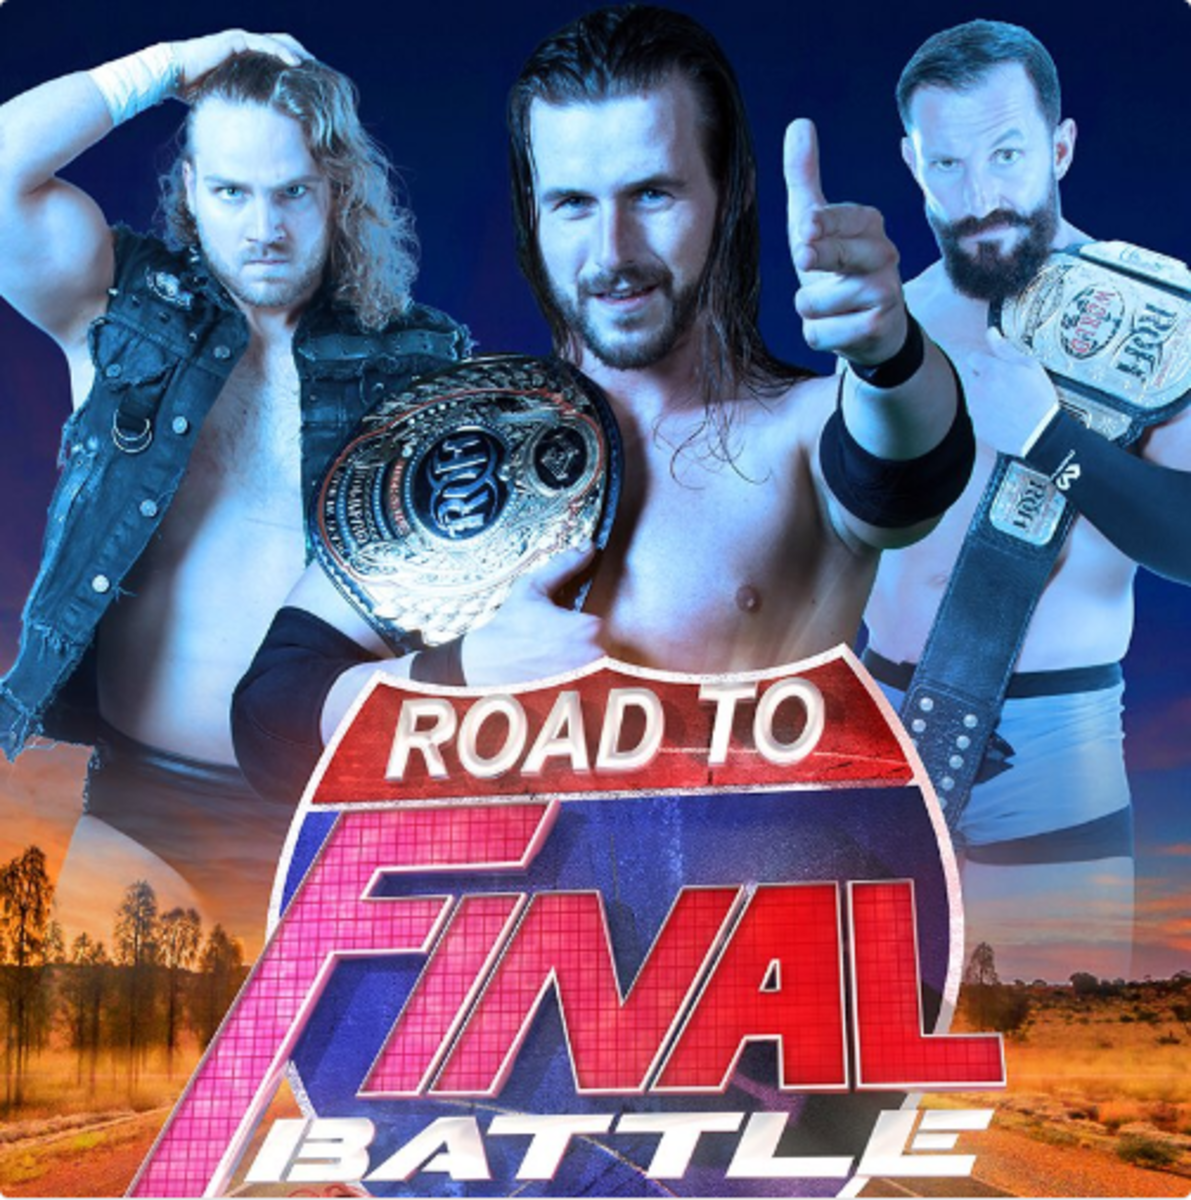 Road to Final Battle